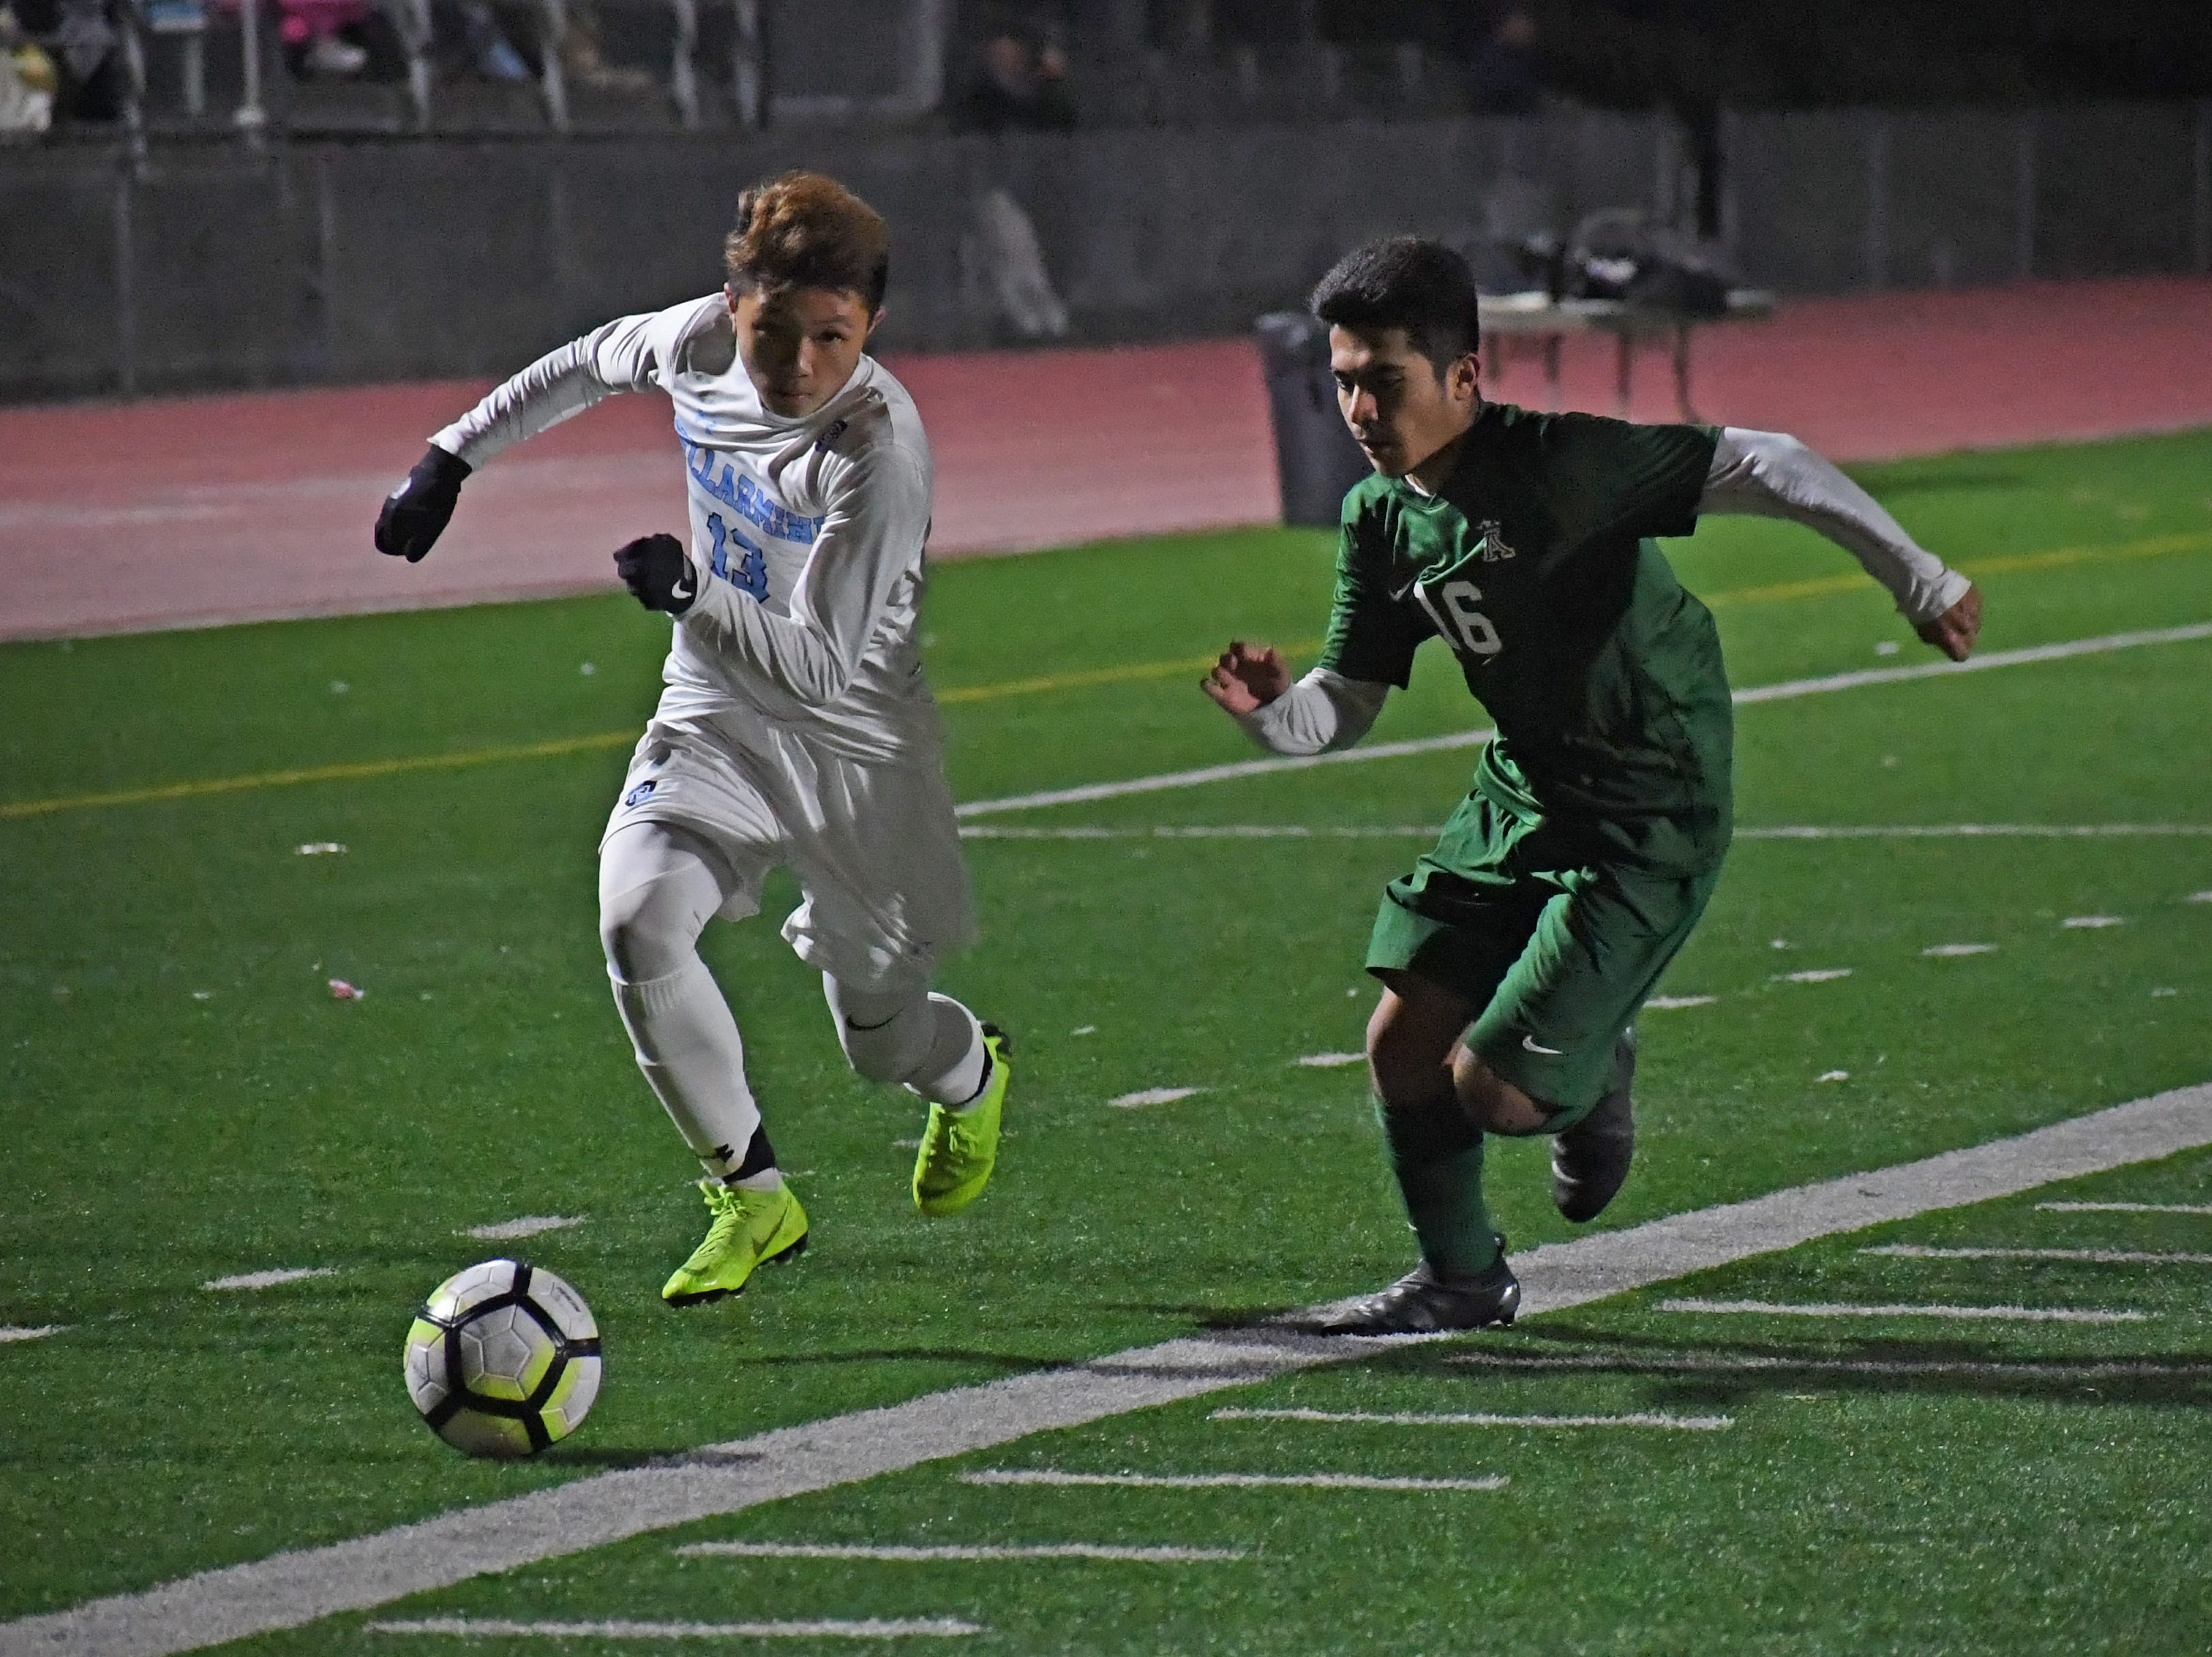 Forward Orlando Juarez-Hernandez (16) shadows a Bellarmine player on the attack.